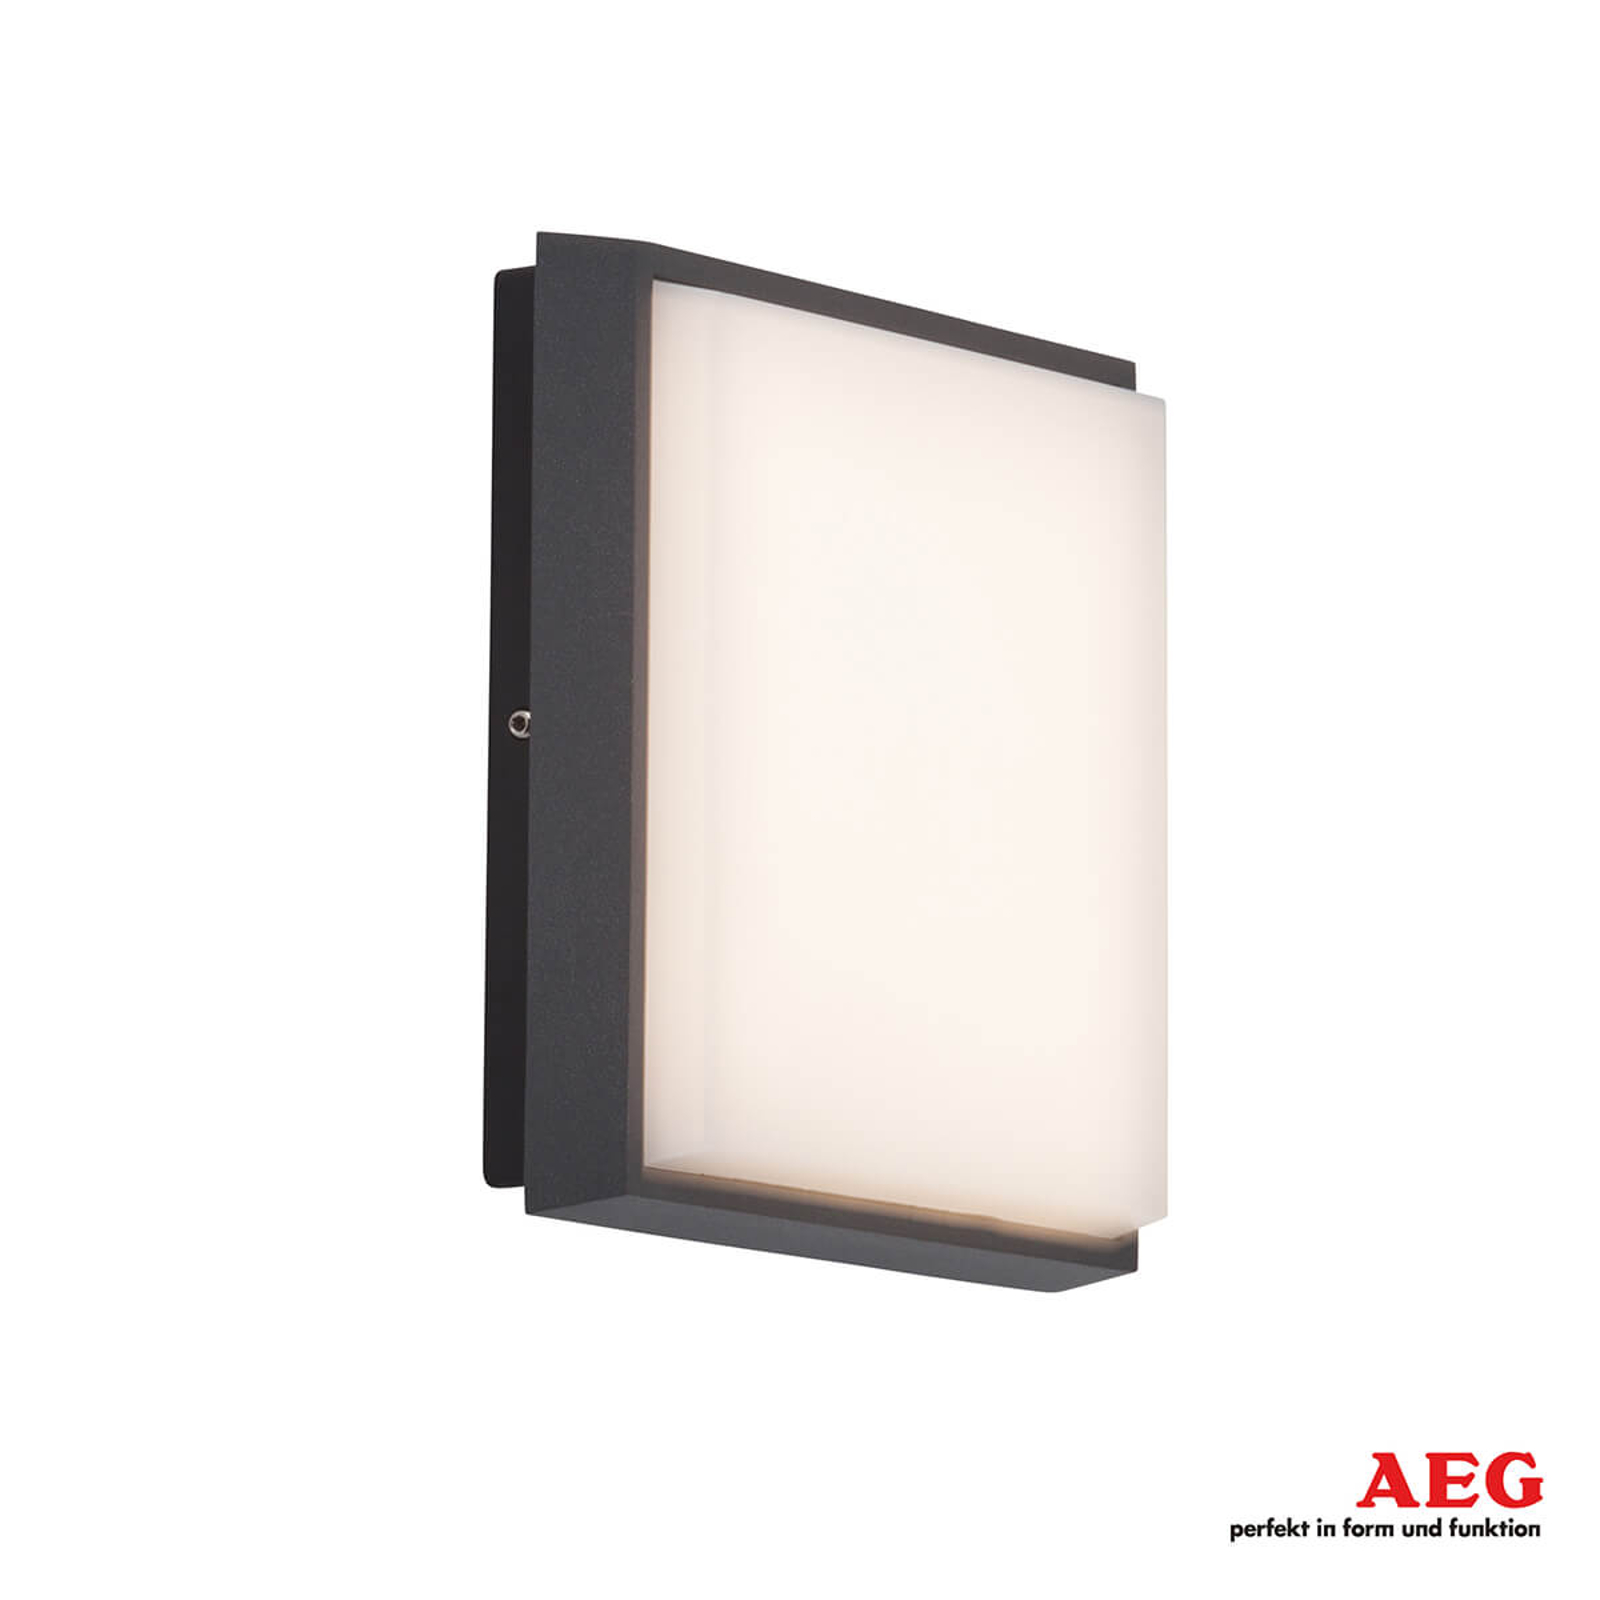 AEG Letan Square - eckige LED-Außenwandlampe 9 W